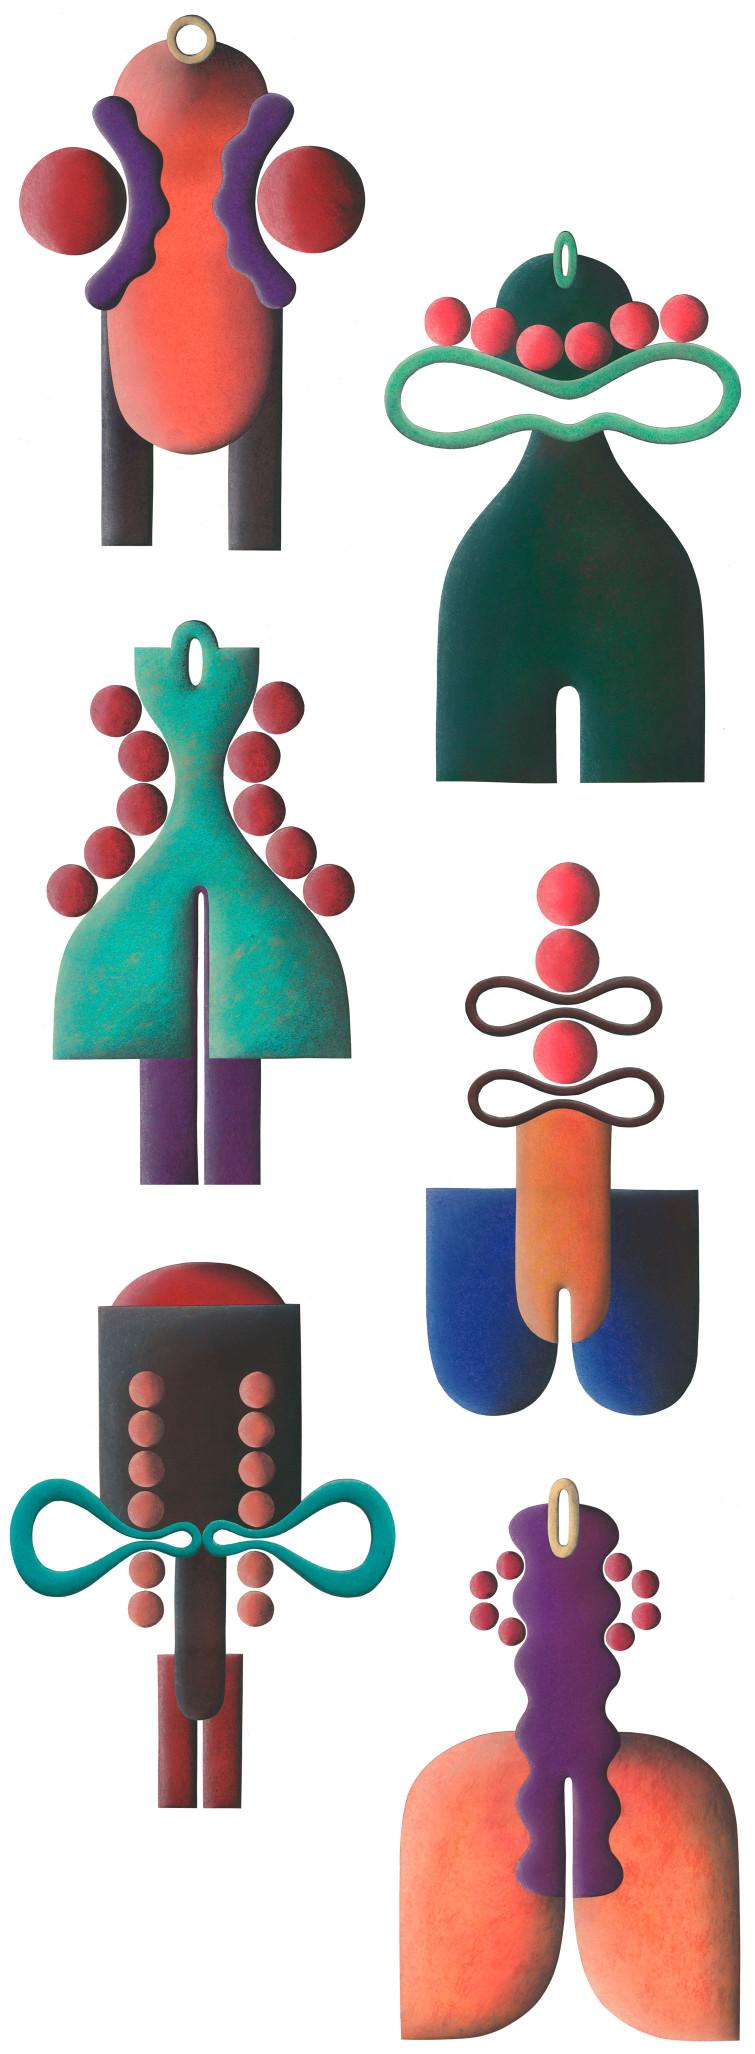 Uli Meisenheimer-Das-männlich-weiblich-Phaenomen-Idée, textes et illustrations- diplôme Folkwangschule Essen 1994